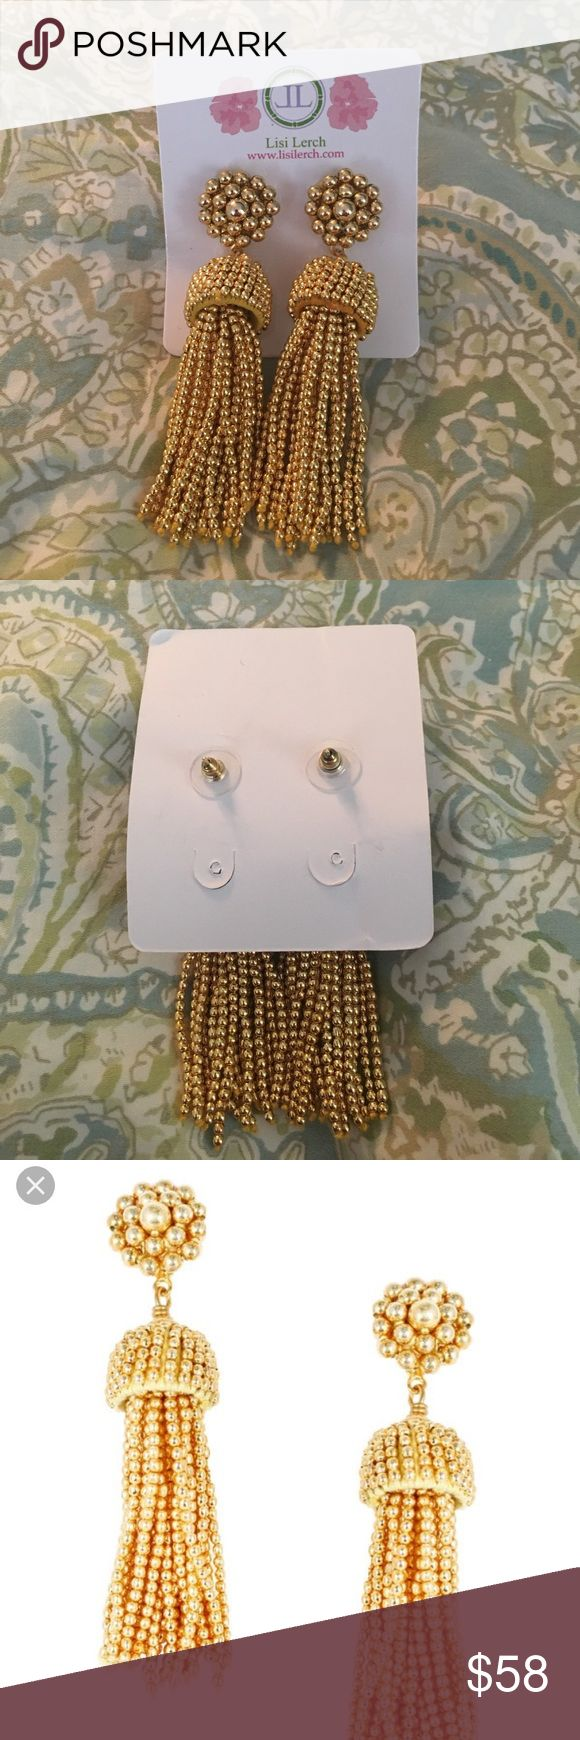 Lisi Lerch gold tassel earring Gold tassel earring by Lisi Lerch lisi lerch Jewelry Earrings